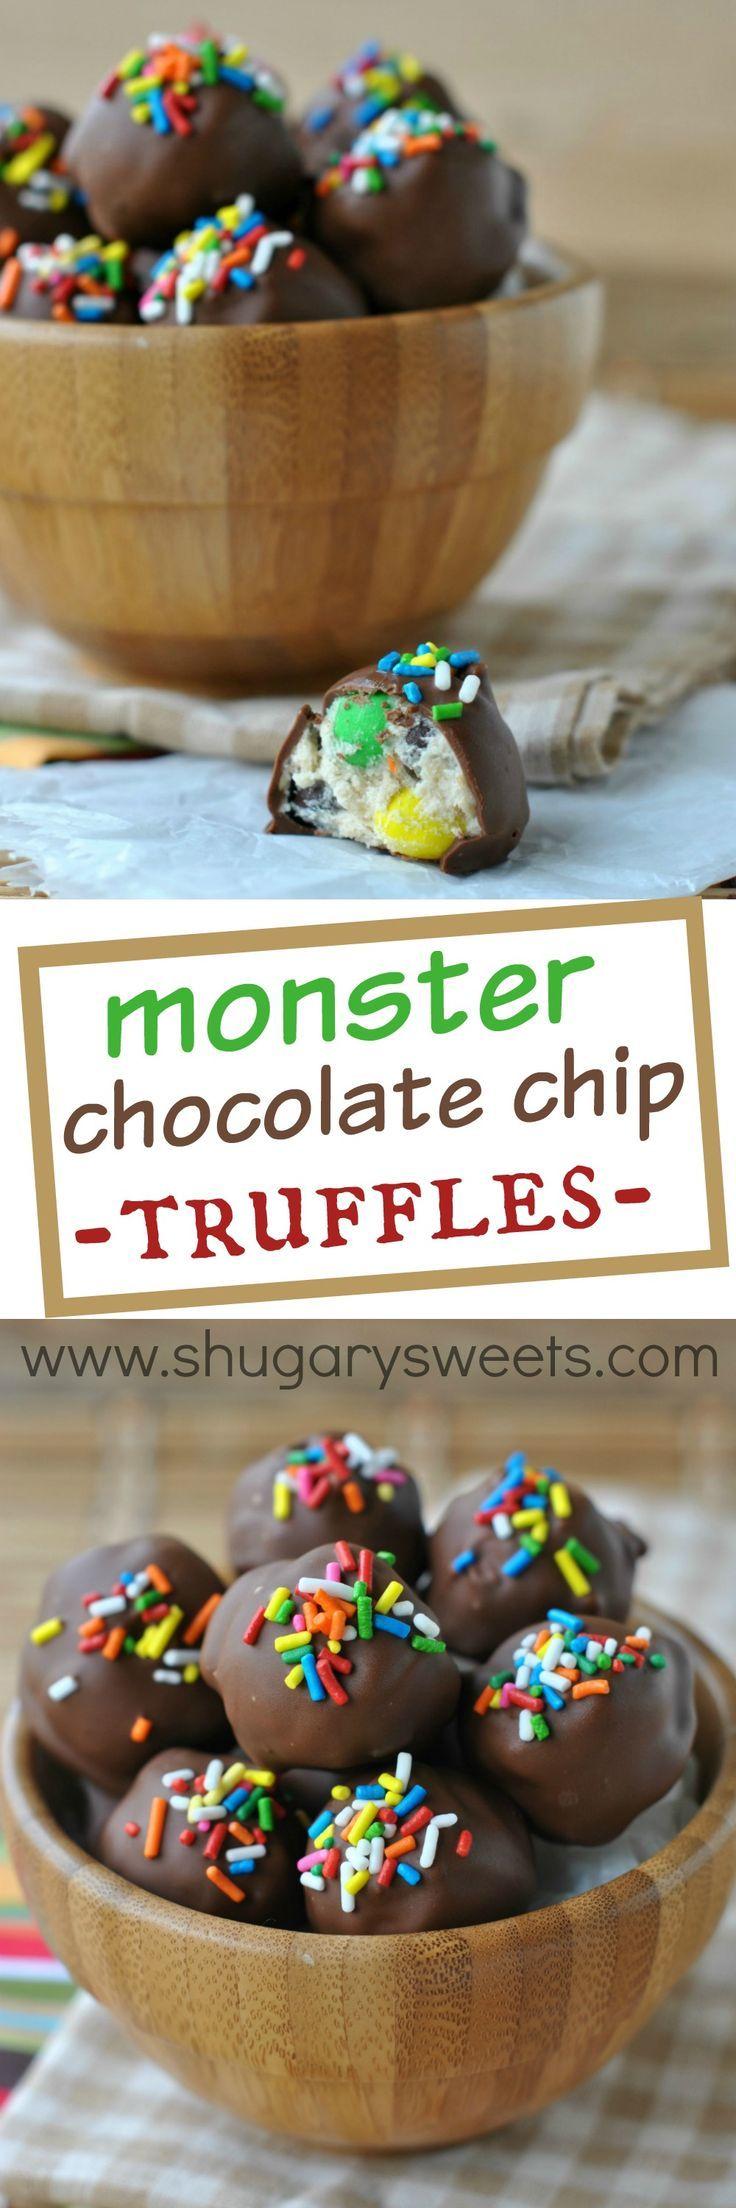 Monster cookie dough truffles: delicious, easy bites of monster cookie dough (egg-free). No bake summer dessert!